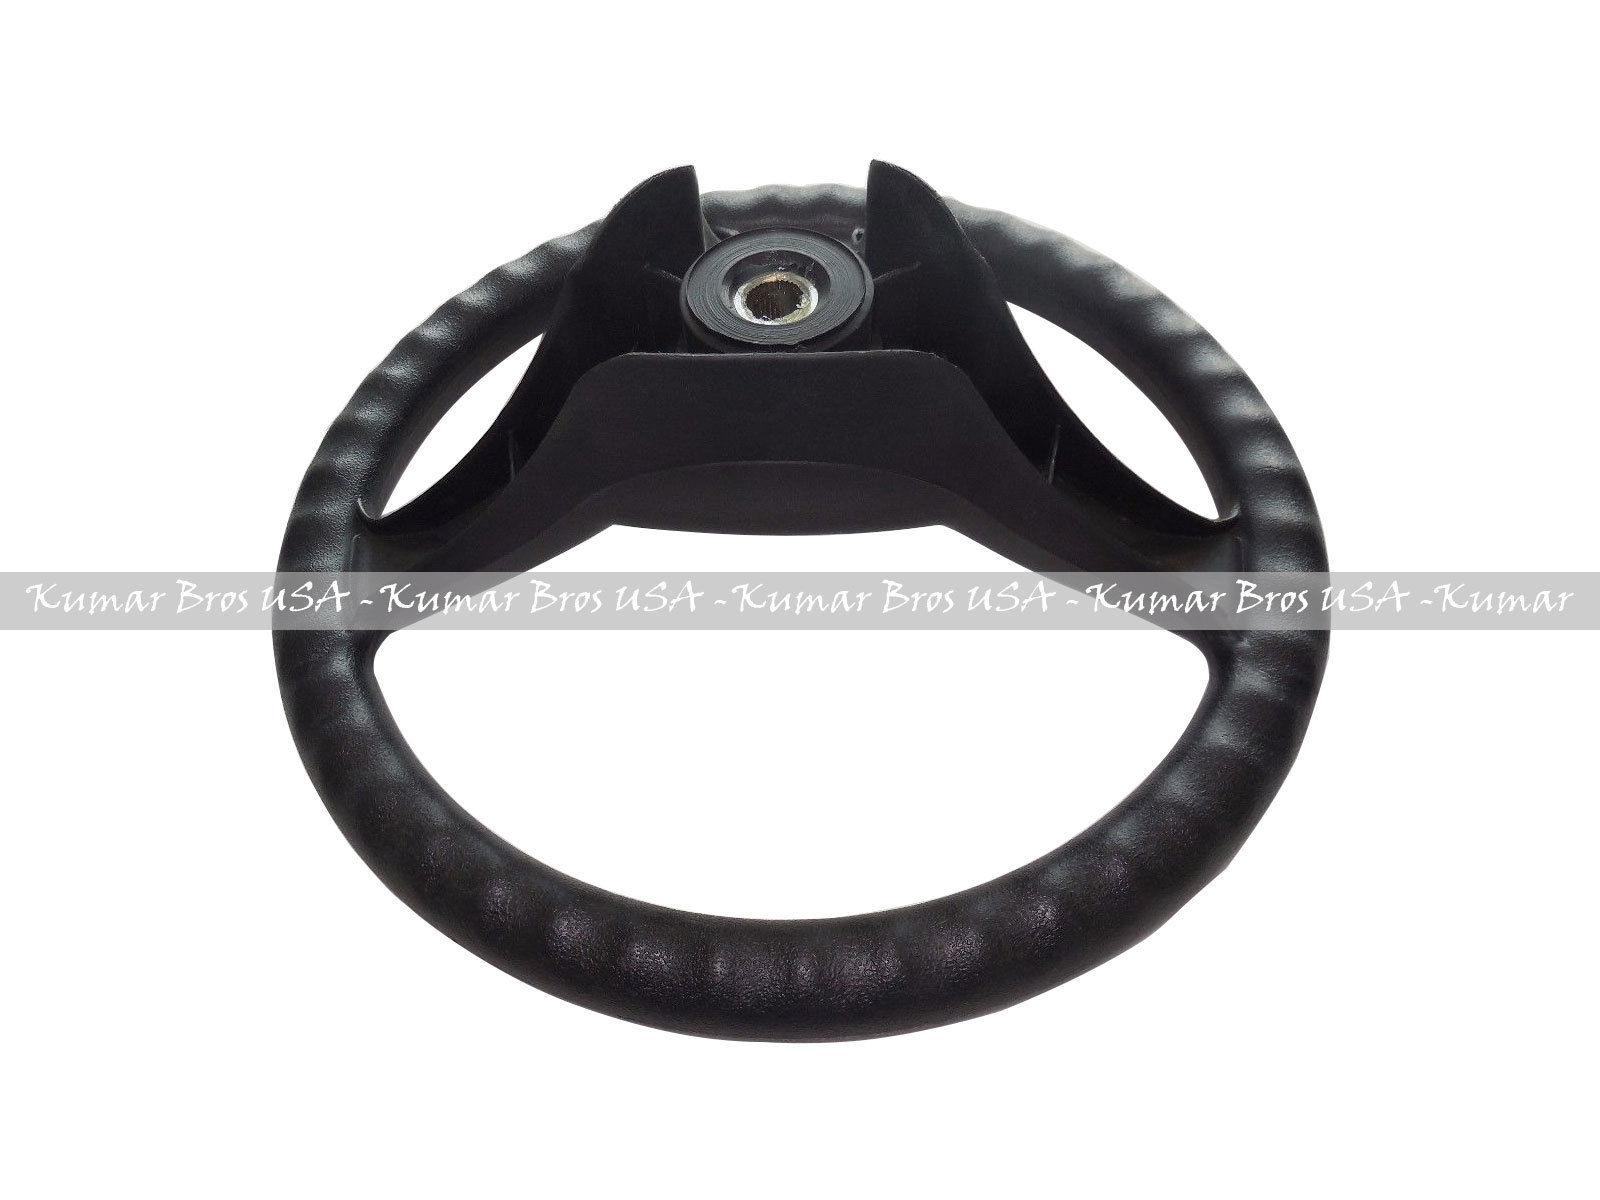 New Steering Wheel Fits John Deere D100 D105 D110 D120 D130 D140